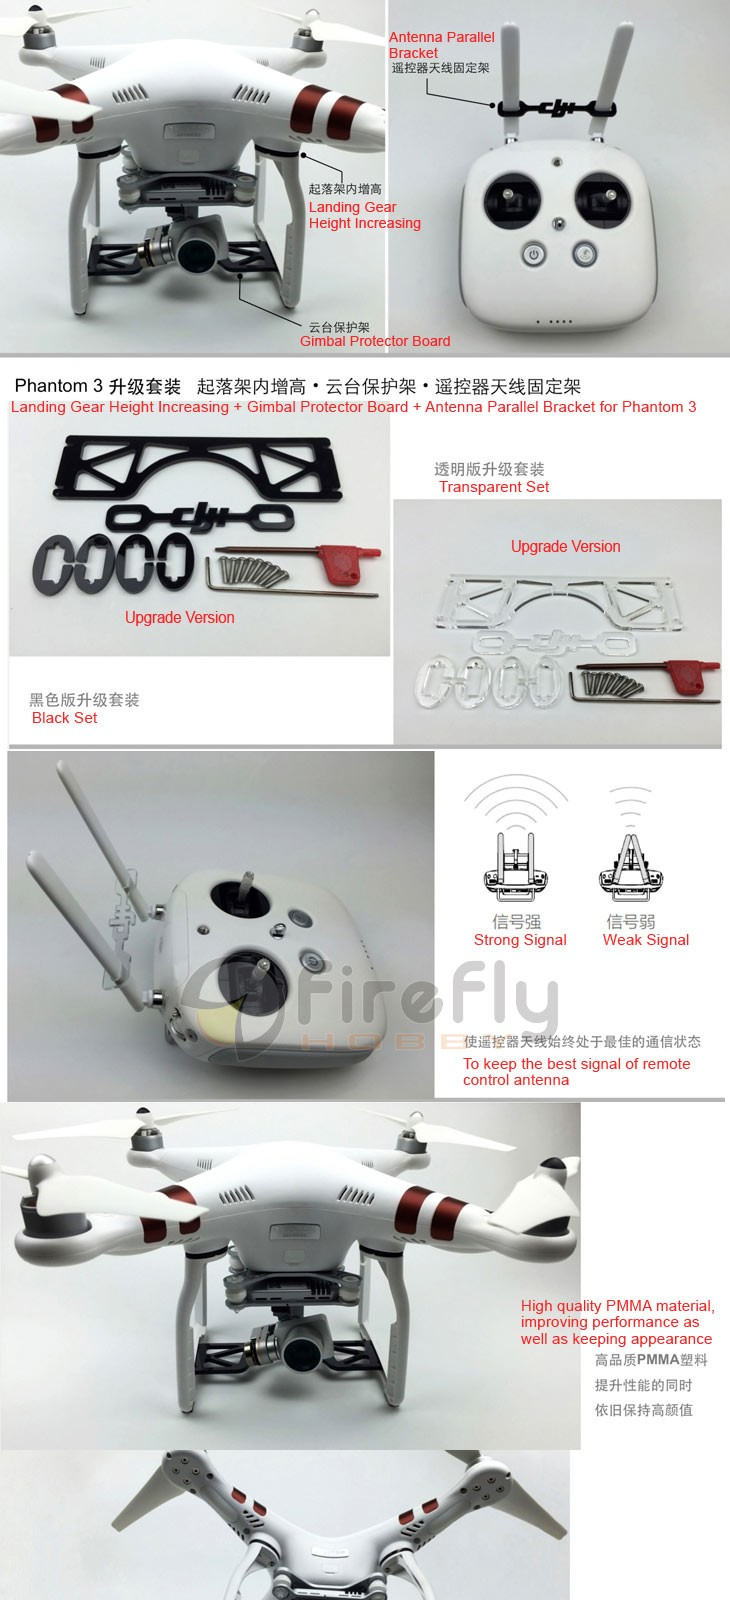 DJI Phantom 3 Accessories Gimbal Protector Plate + Antenna Parallel Bracket + Landing Skid/Gear Height Increasing Upgrade Kit